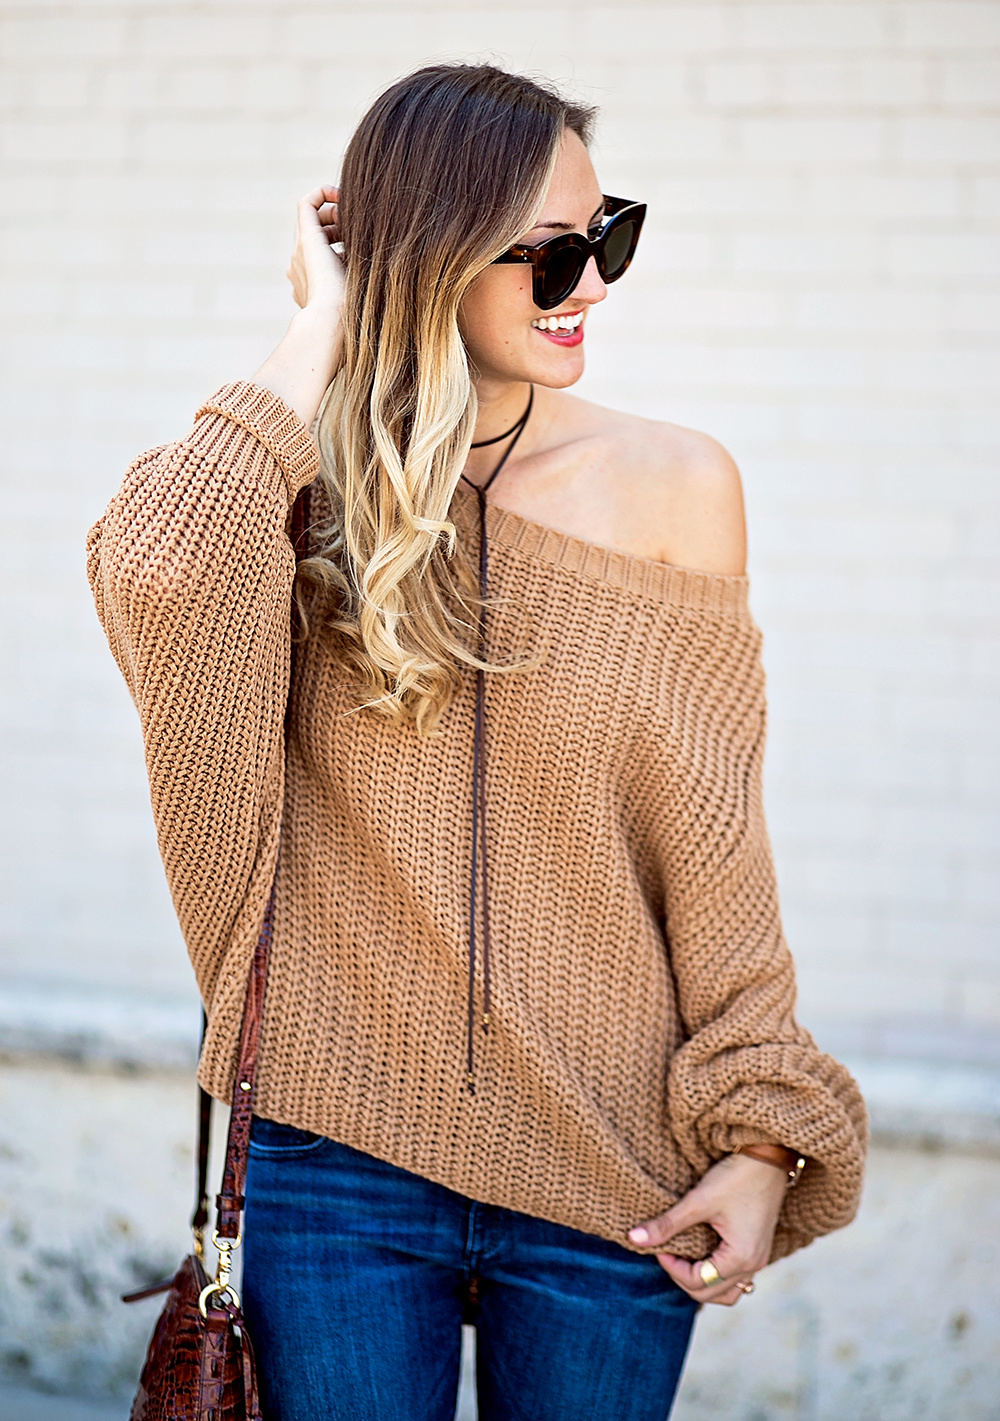 livvyland-blog-olivia-watson-slouchy-oversize-knit-sweater-minnetonka-el-paso-ii-moccasin-boho-outfit-6